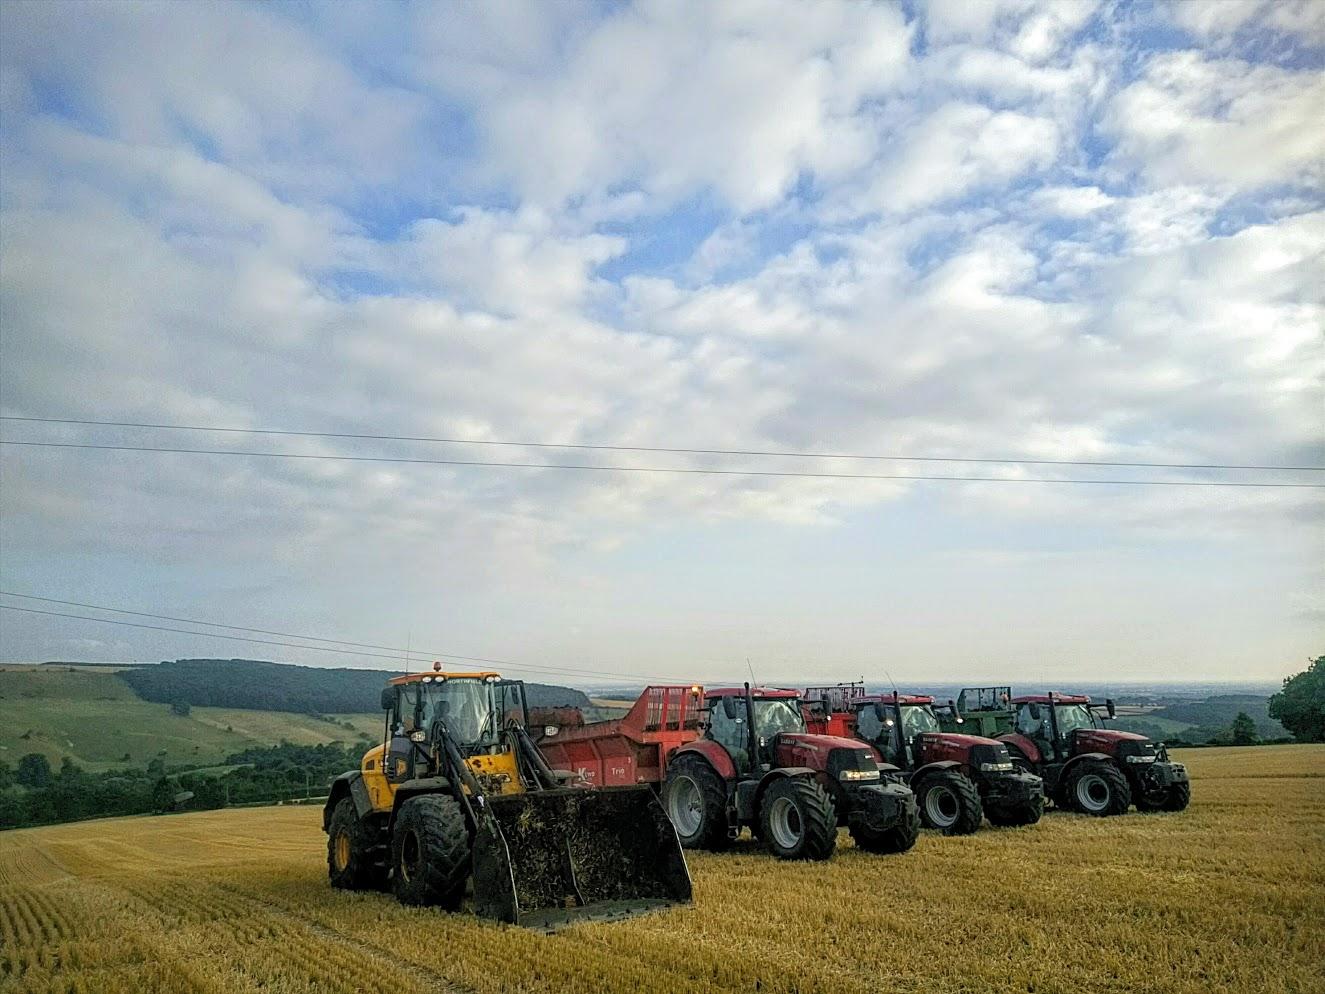 imag0076_1-3-tractor.jpg